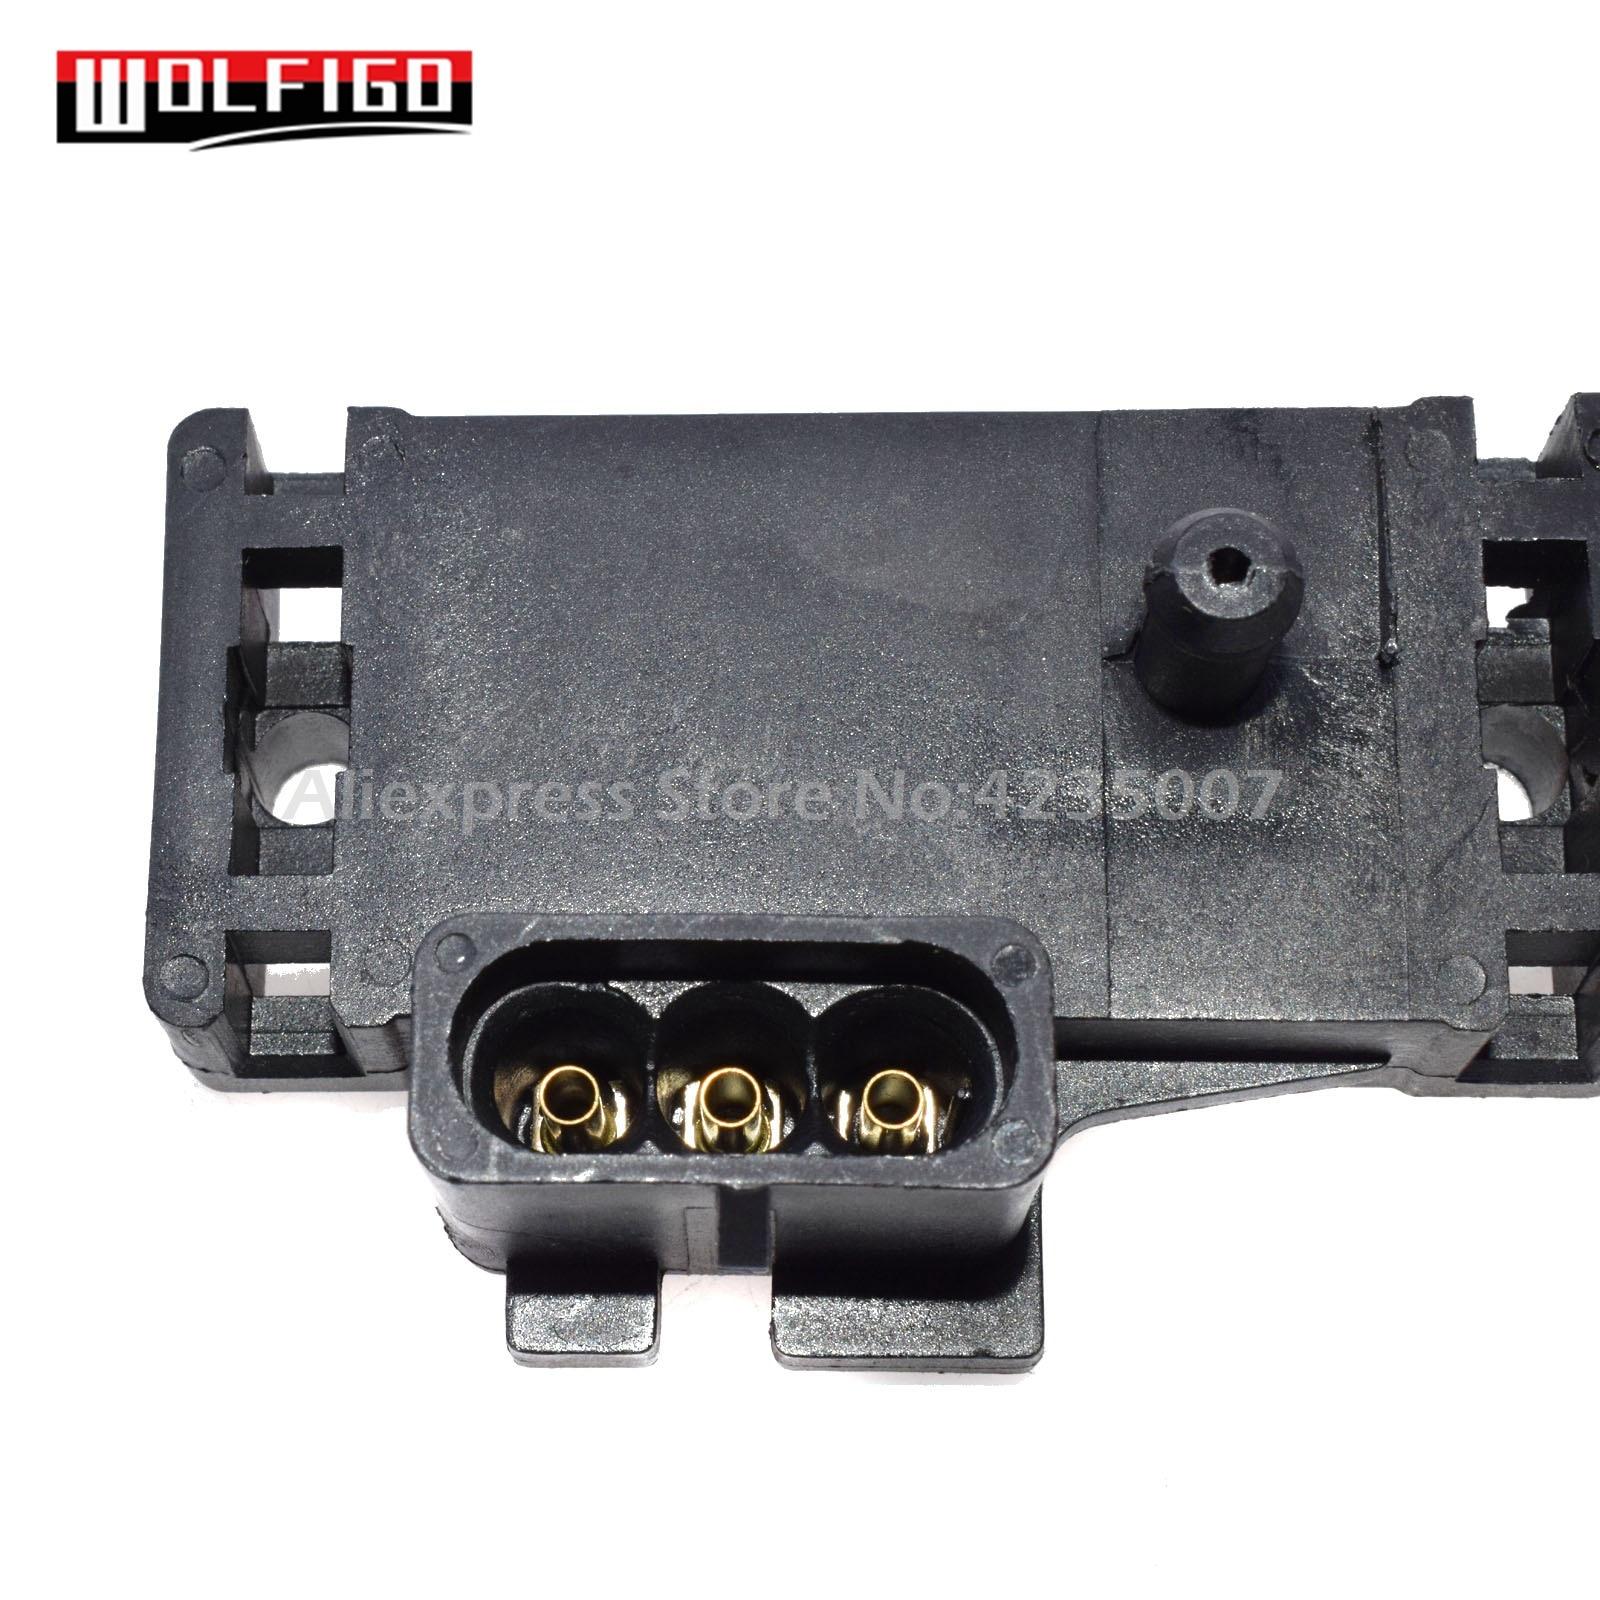 WOLFIGO NEW 1 Bar MAP Sensor W/ Pigtail Connector Plug For Chevy Buick  Pontiac Isuzu Jeep Cadillac 16254719,16175339,12247561